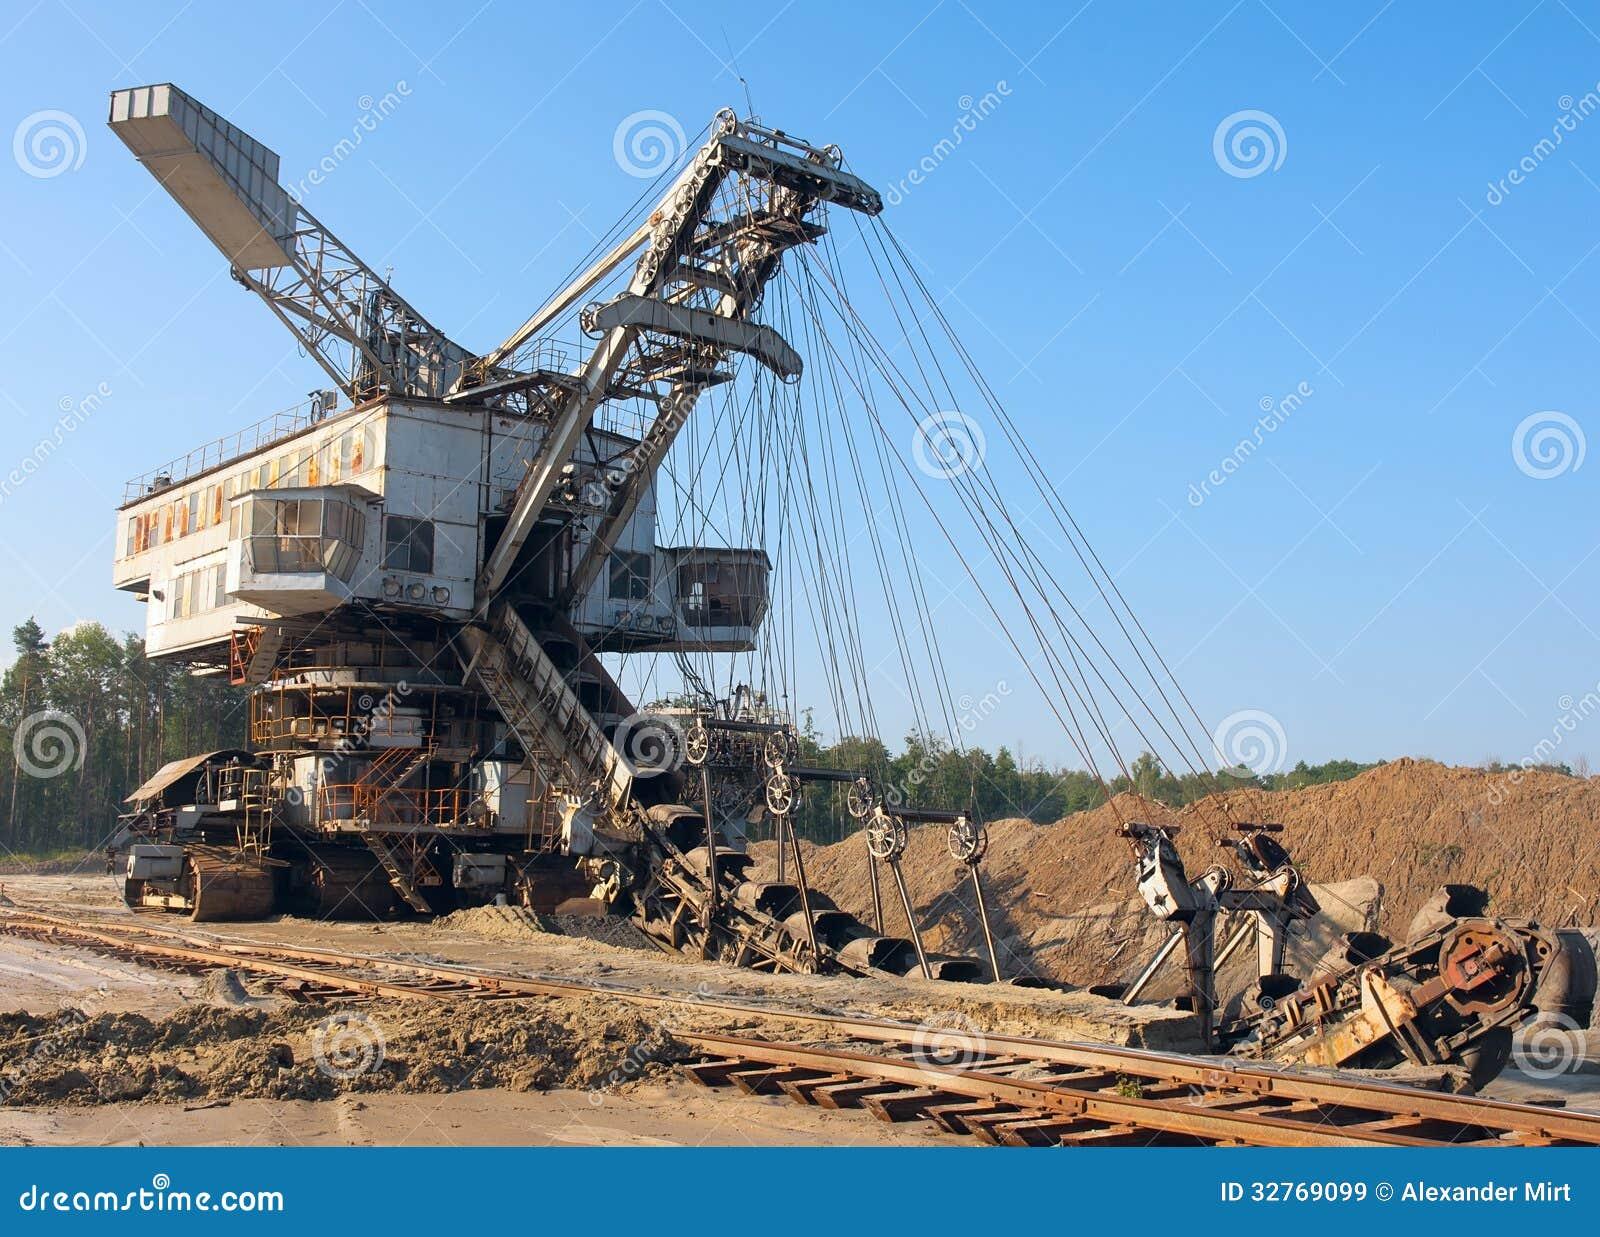 mine machine